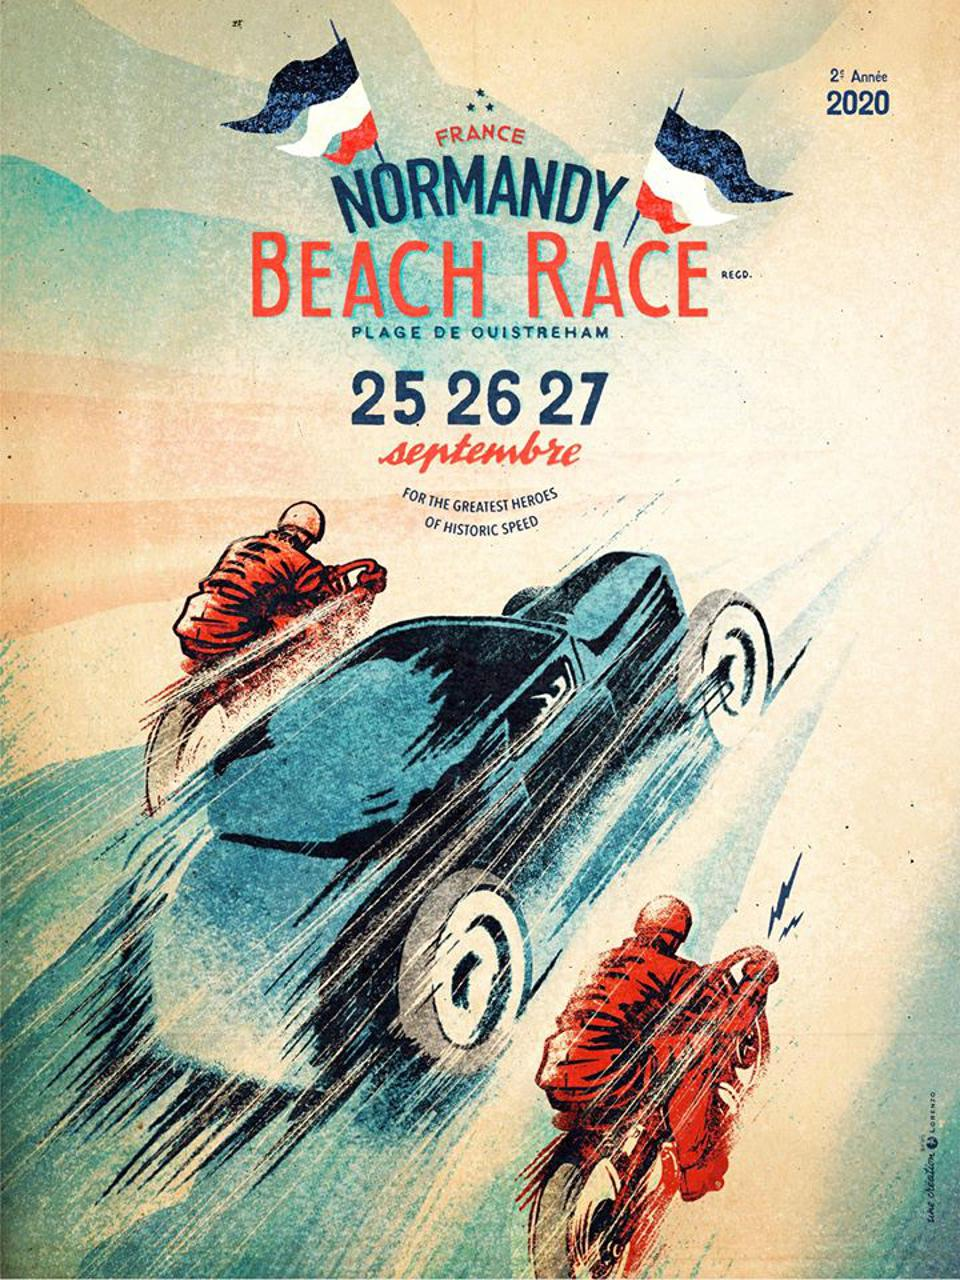 Normandy beach race France America vintage cars US Europe